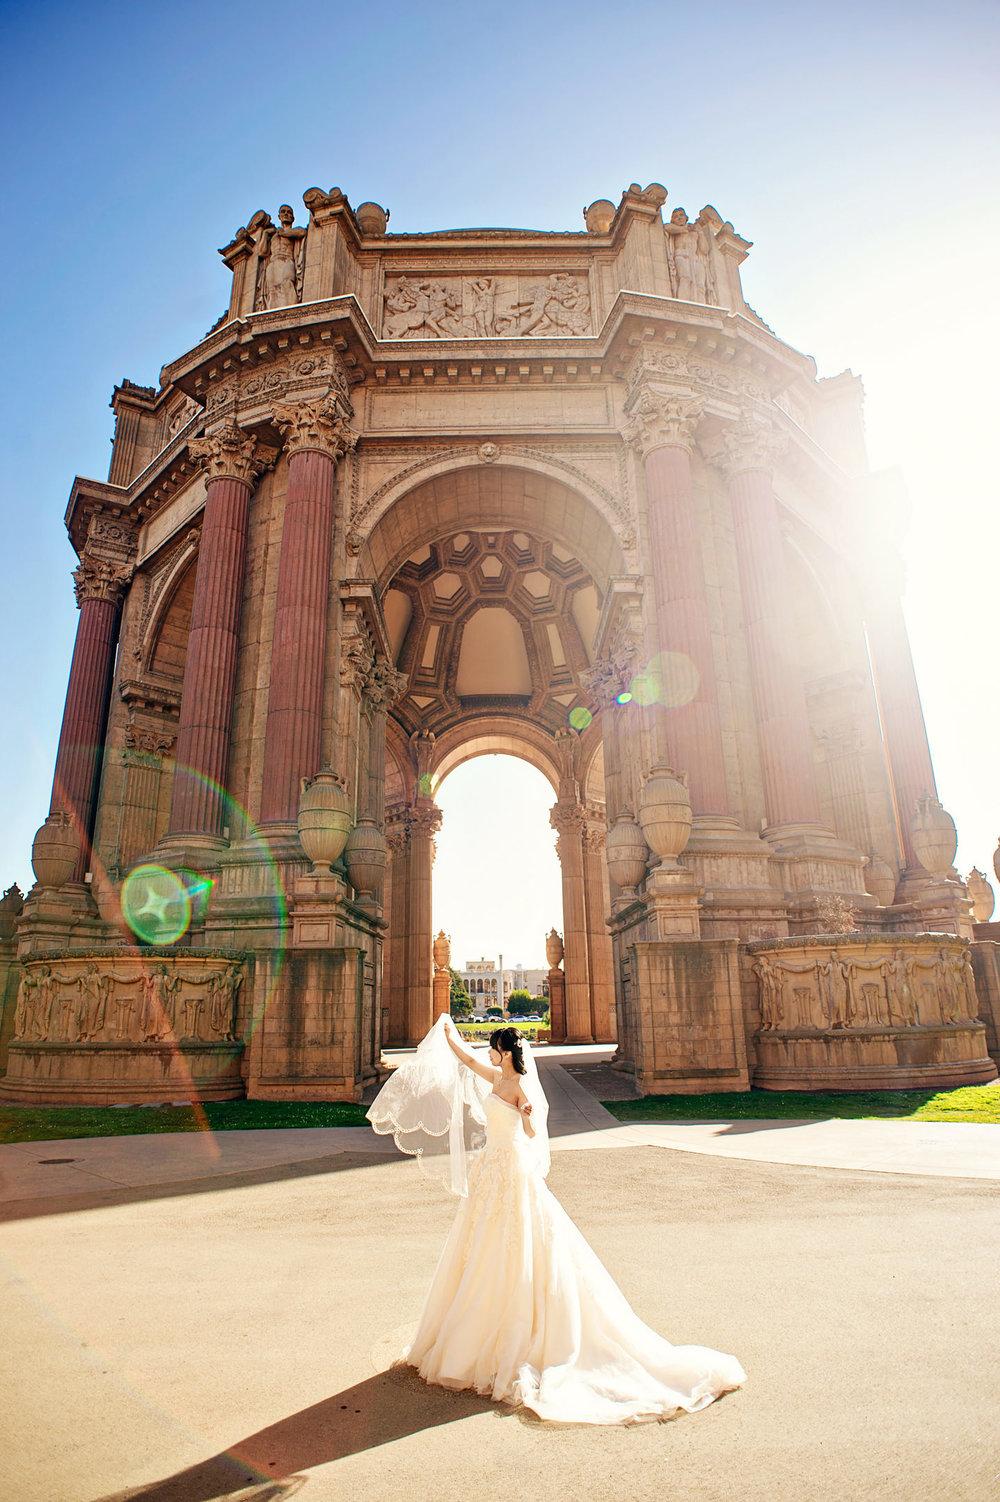 Chris_Hui_婚禮_婚紗照_pre_wedding_photography_best_071_.jpg